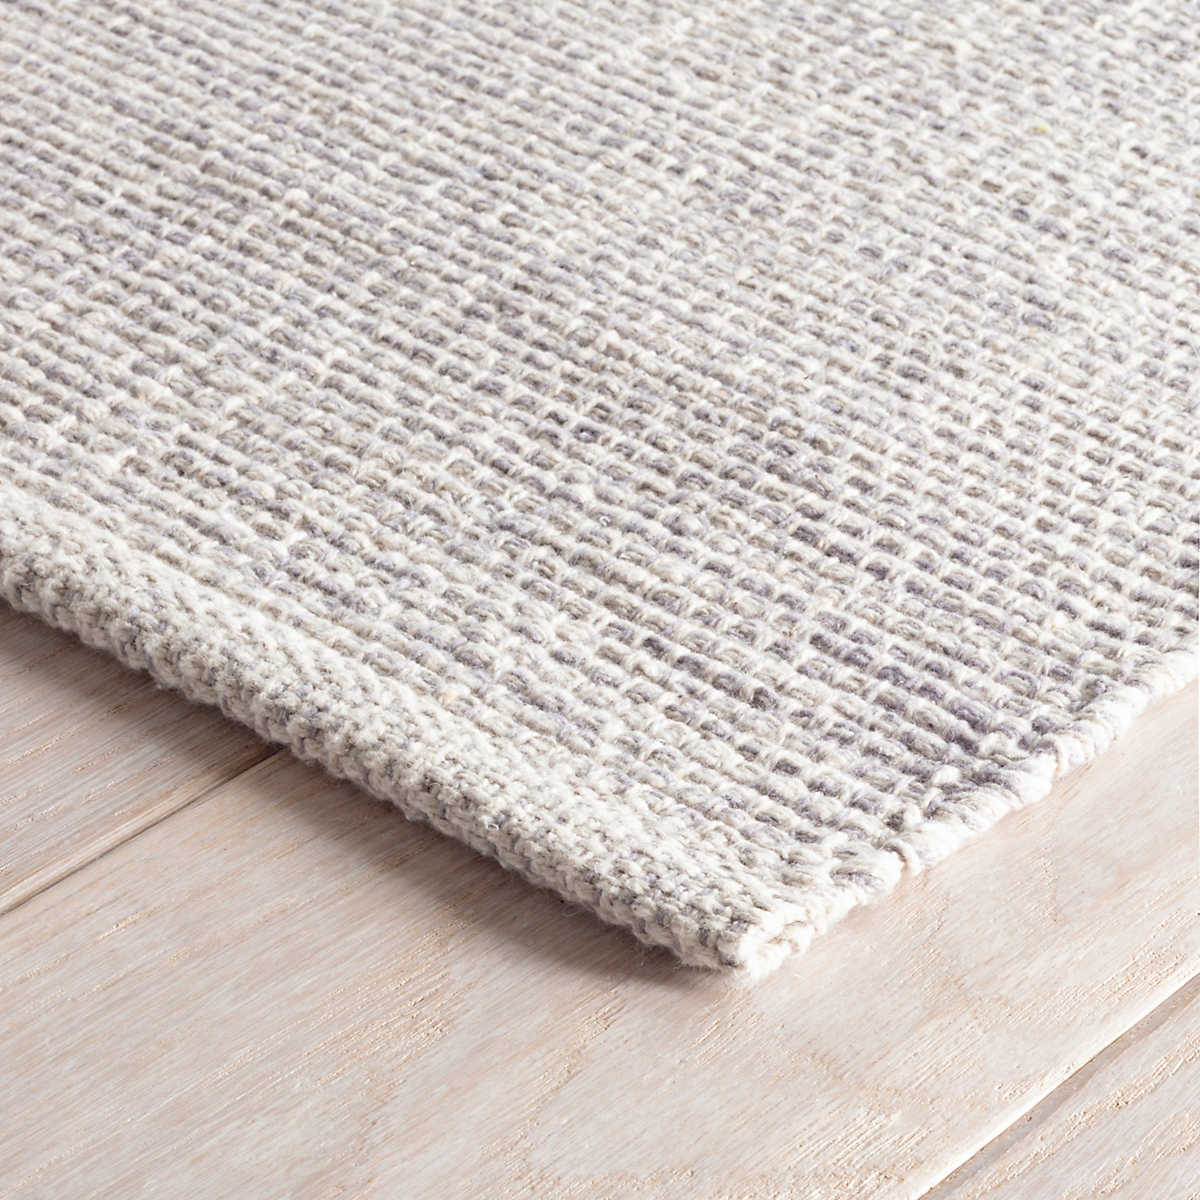 Marled Grey Woven Cotton Rug Dash Albert